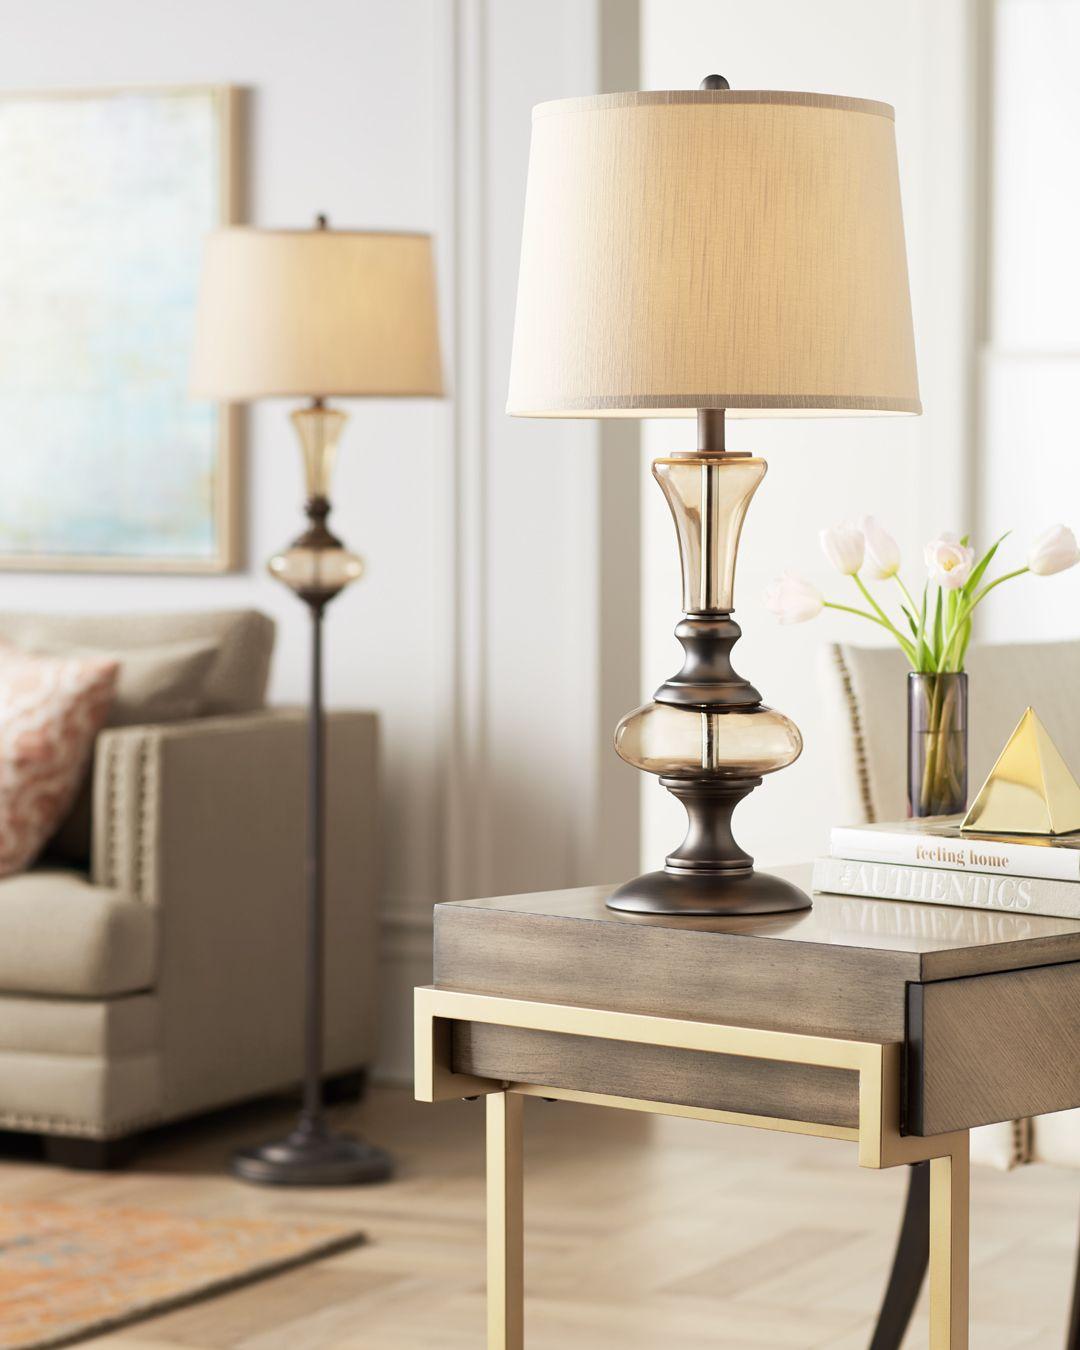 Olive Glow Matching Table Floor Lamp Floor Lamp Table Lamp Floor Lamp